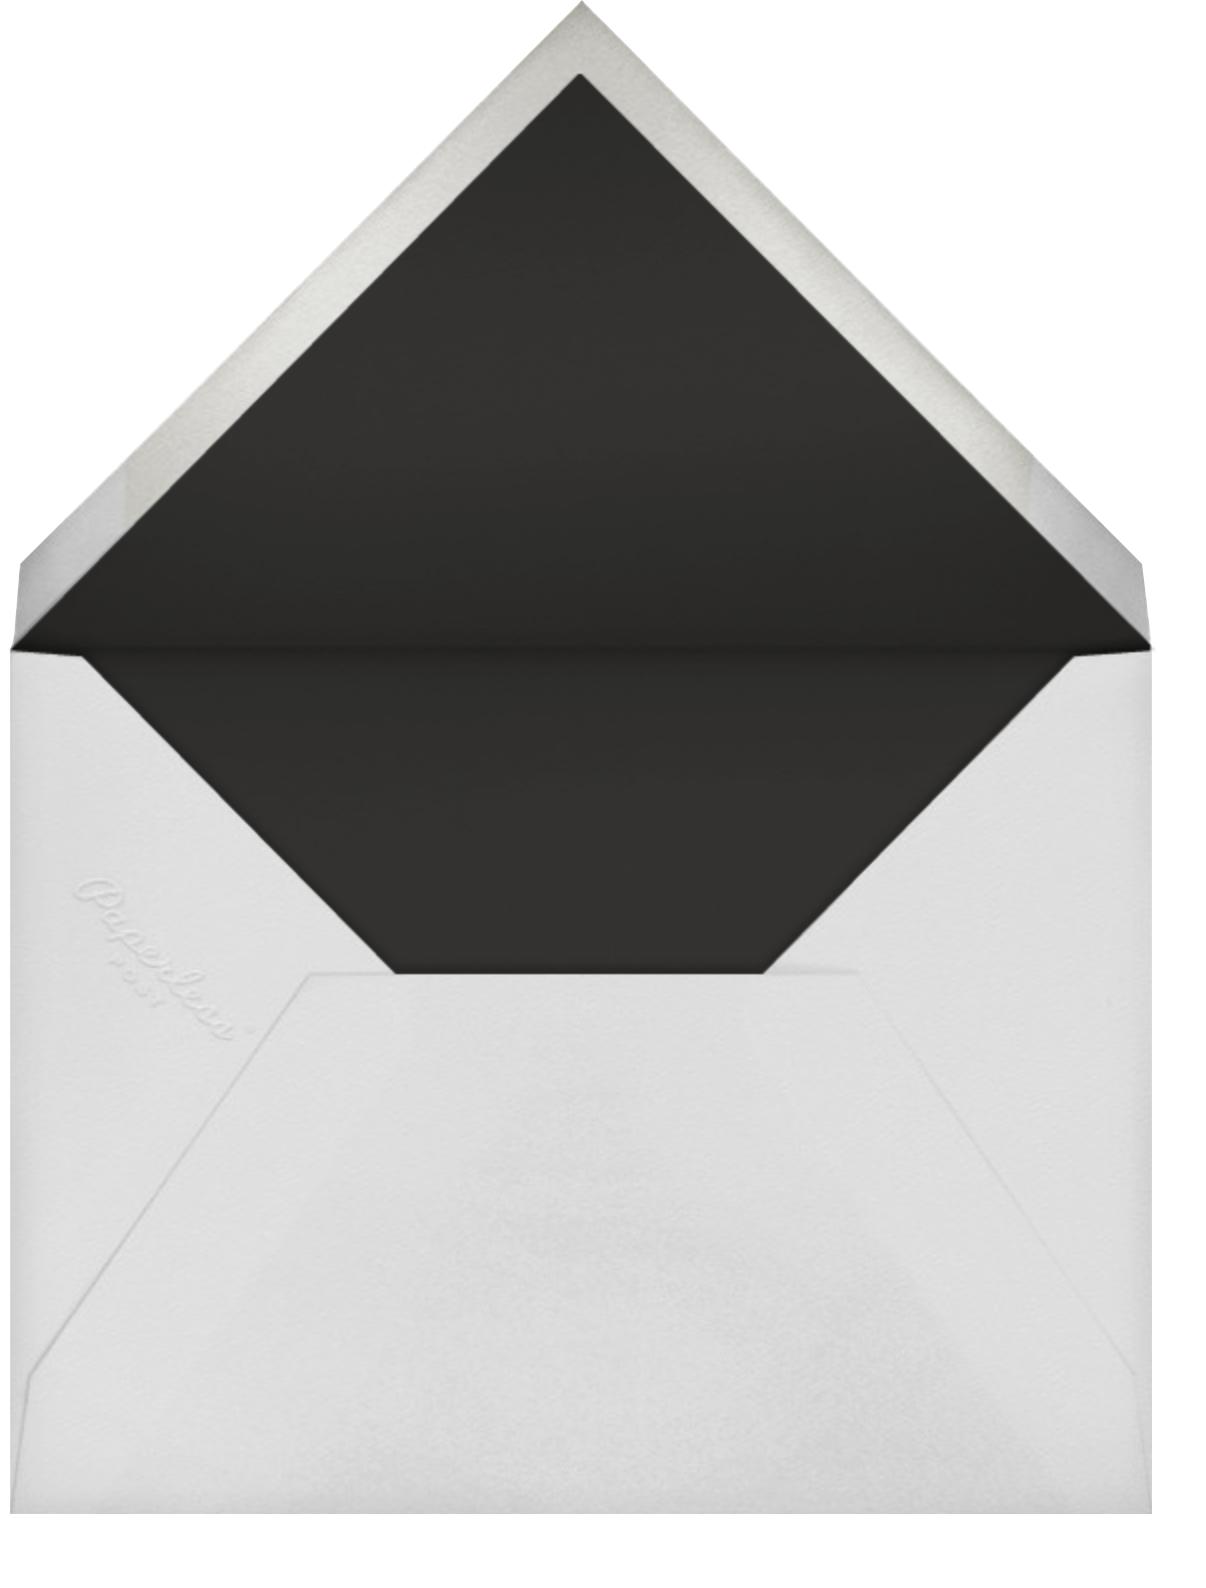 Durham - Black - Paperless Post - Dinner party - envelope back